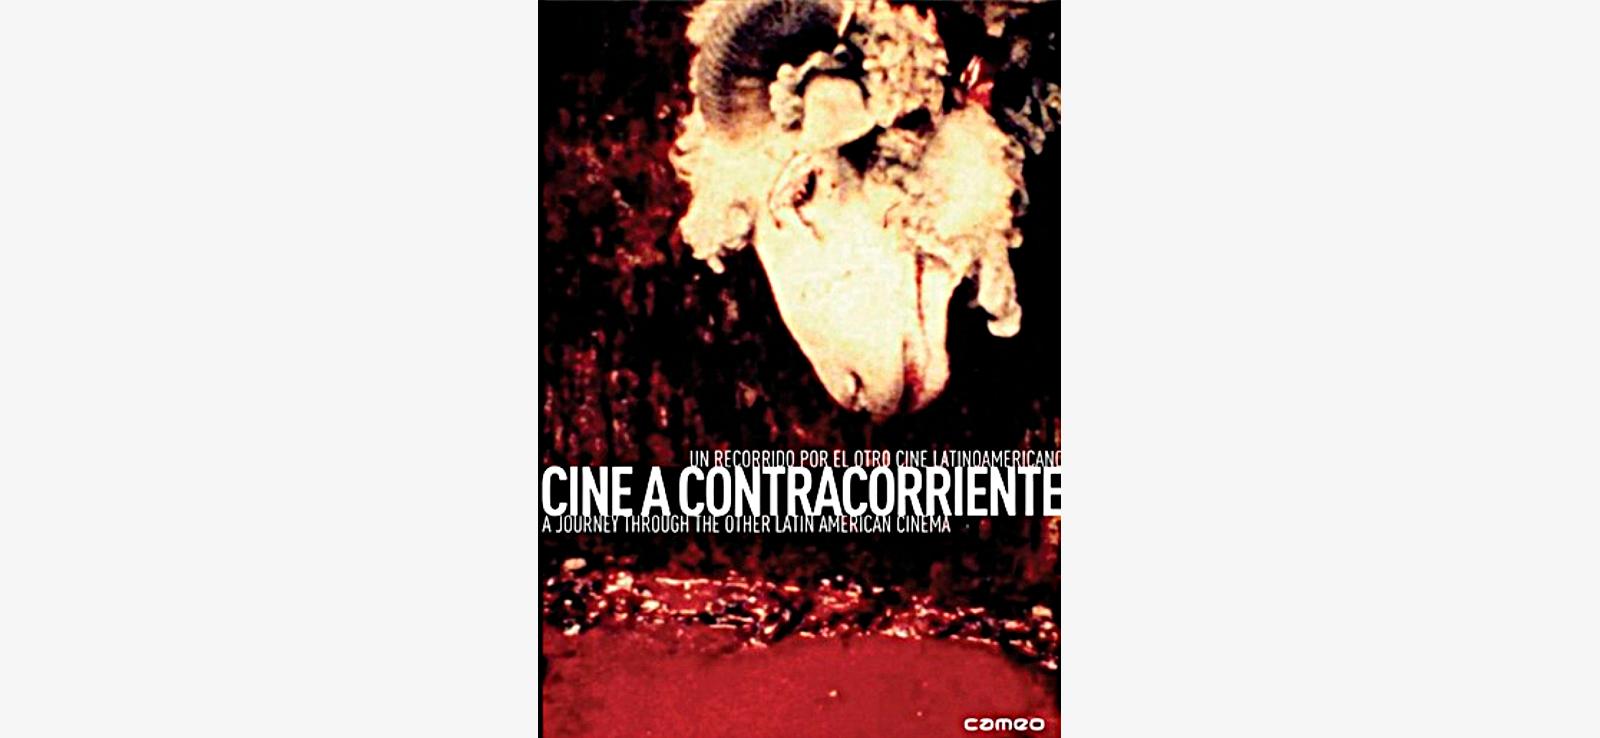 Antoni-Pinent-film-curator-Retrospective-cinema-against-the-tide-book-cover